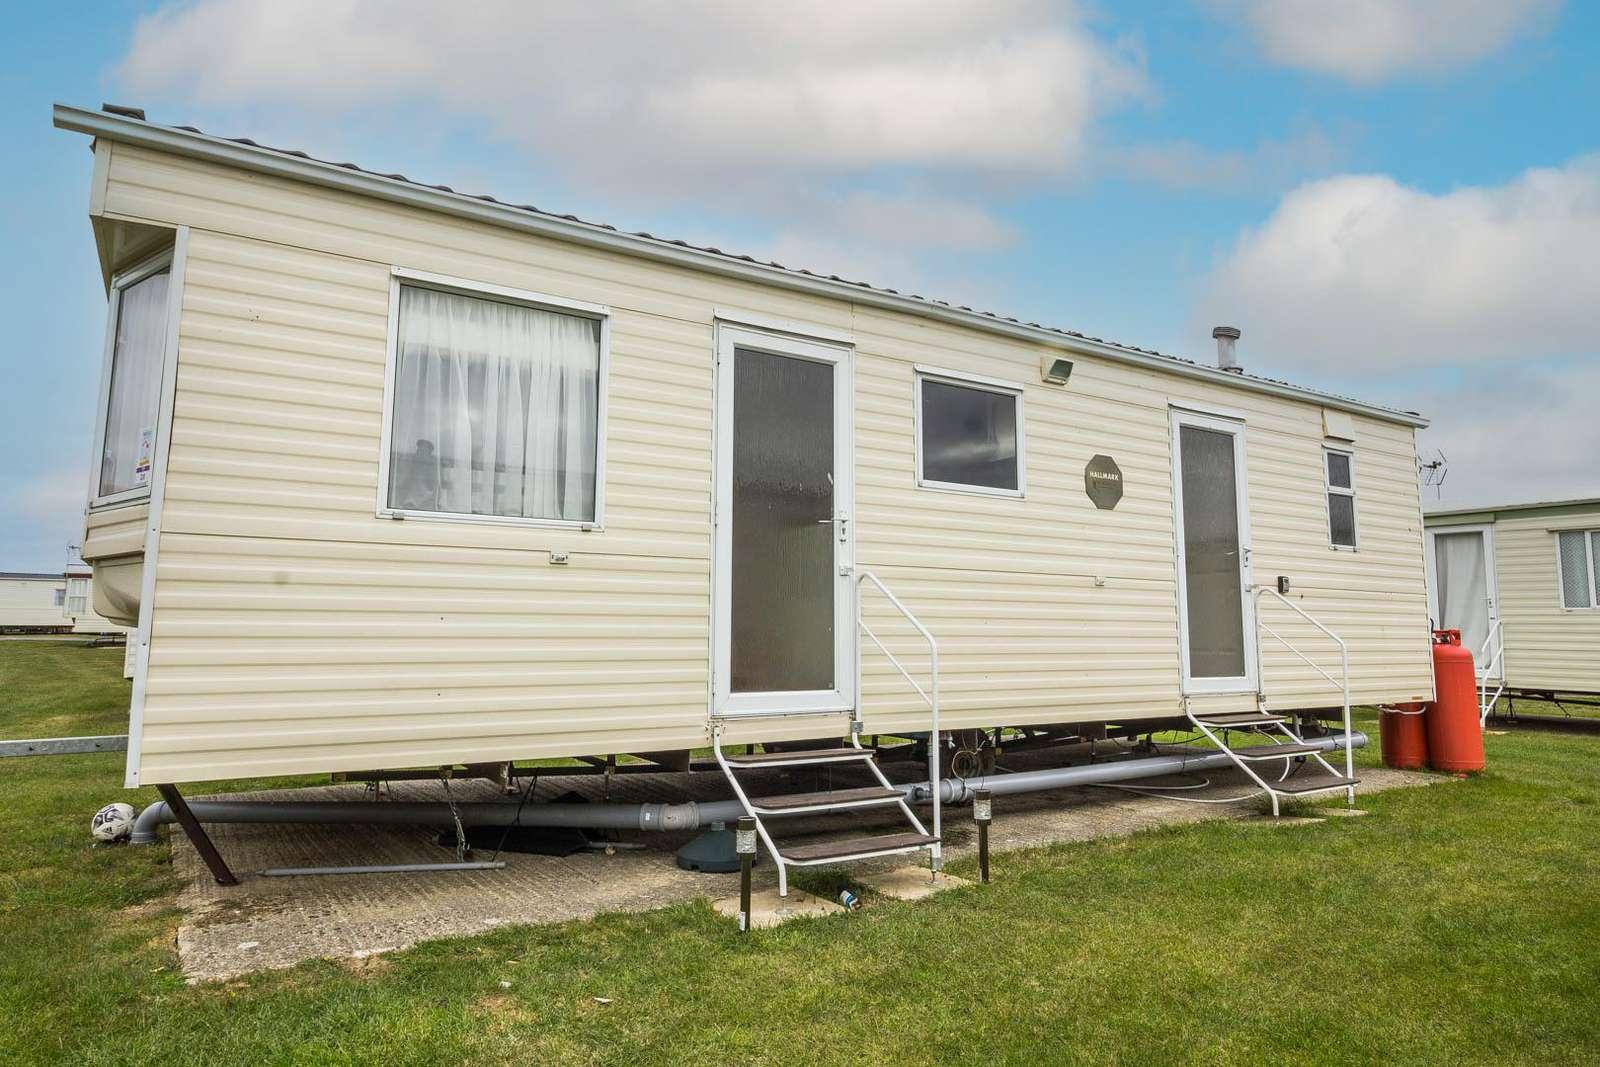 29020Y – Y Area, 2 bed, 6 berth caravan with panel heating. Emerald rated. - property